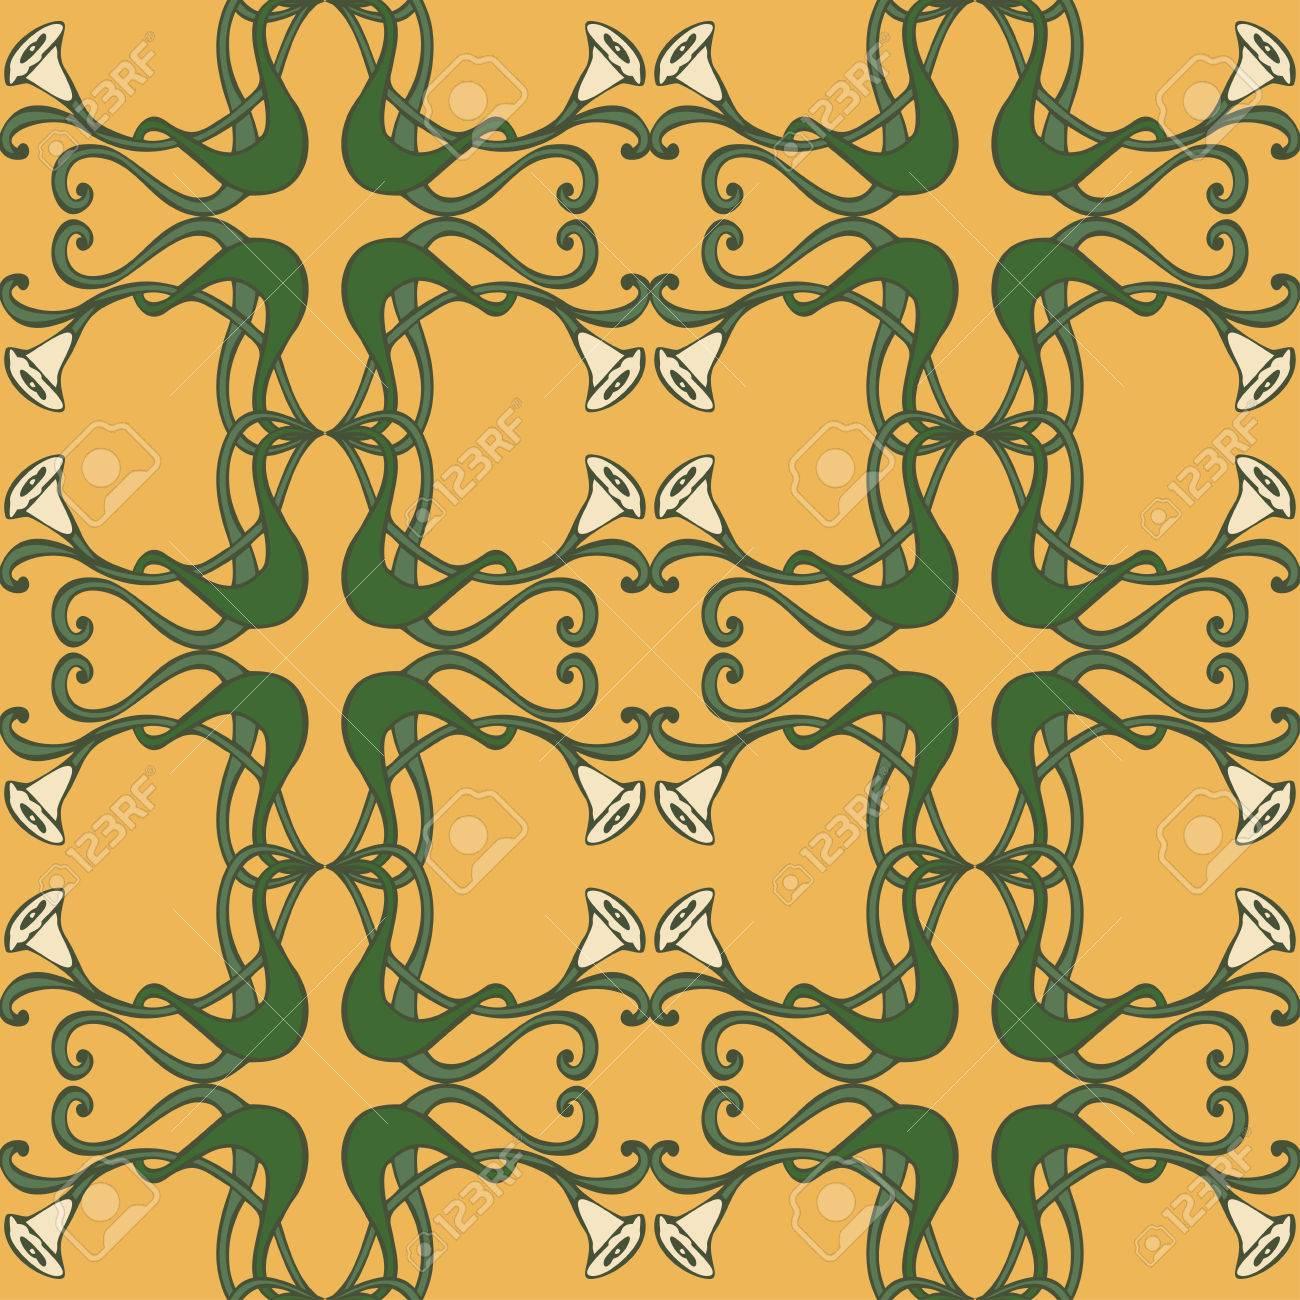 Art deco ornaments - Art Nouveau And Art Deco Floral Ornaments Modern Seamless Pattern Jugendstil Vintage Elements Stock